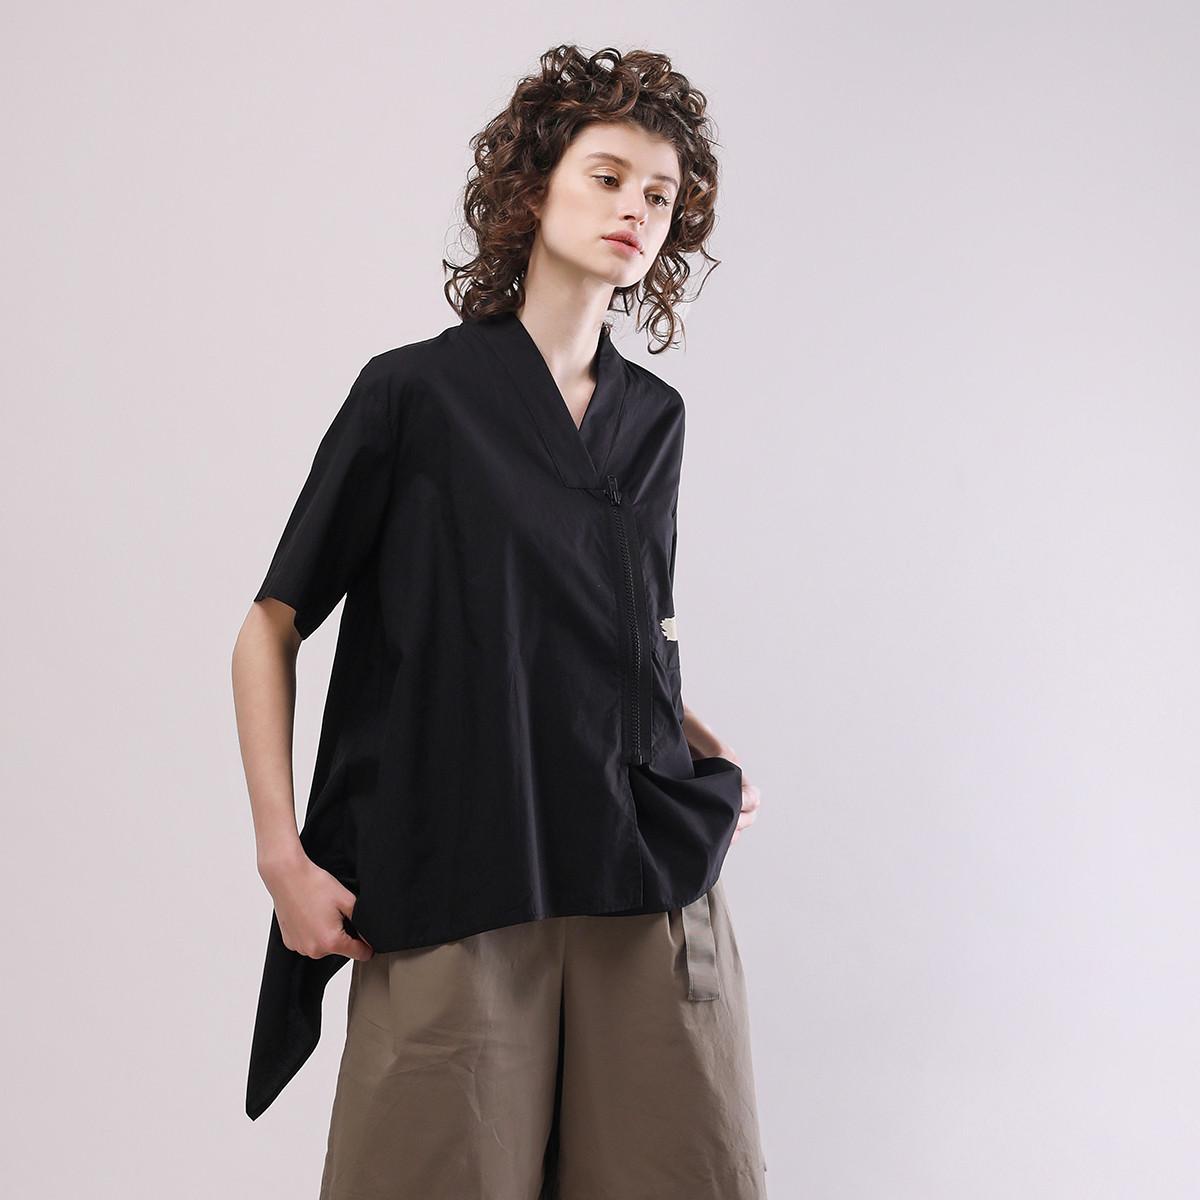 OTT夏装女款 A型V领后背抽褶短袖上衣TT66W176996